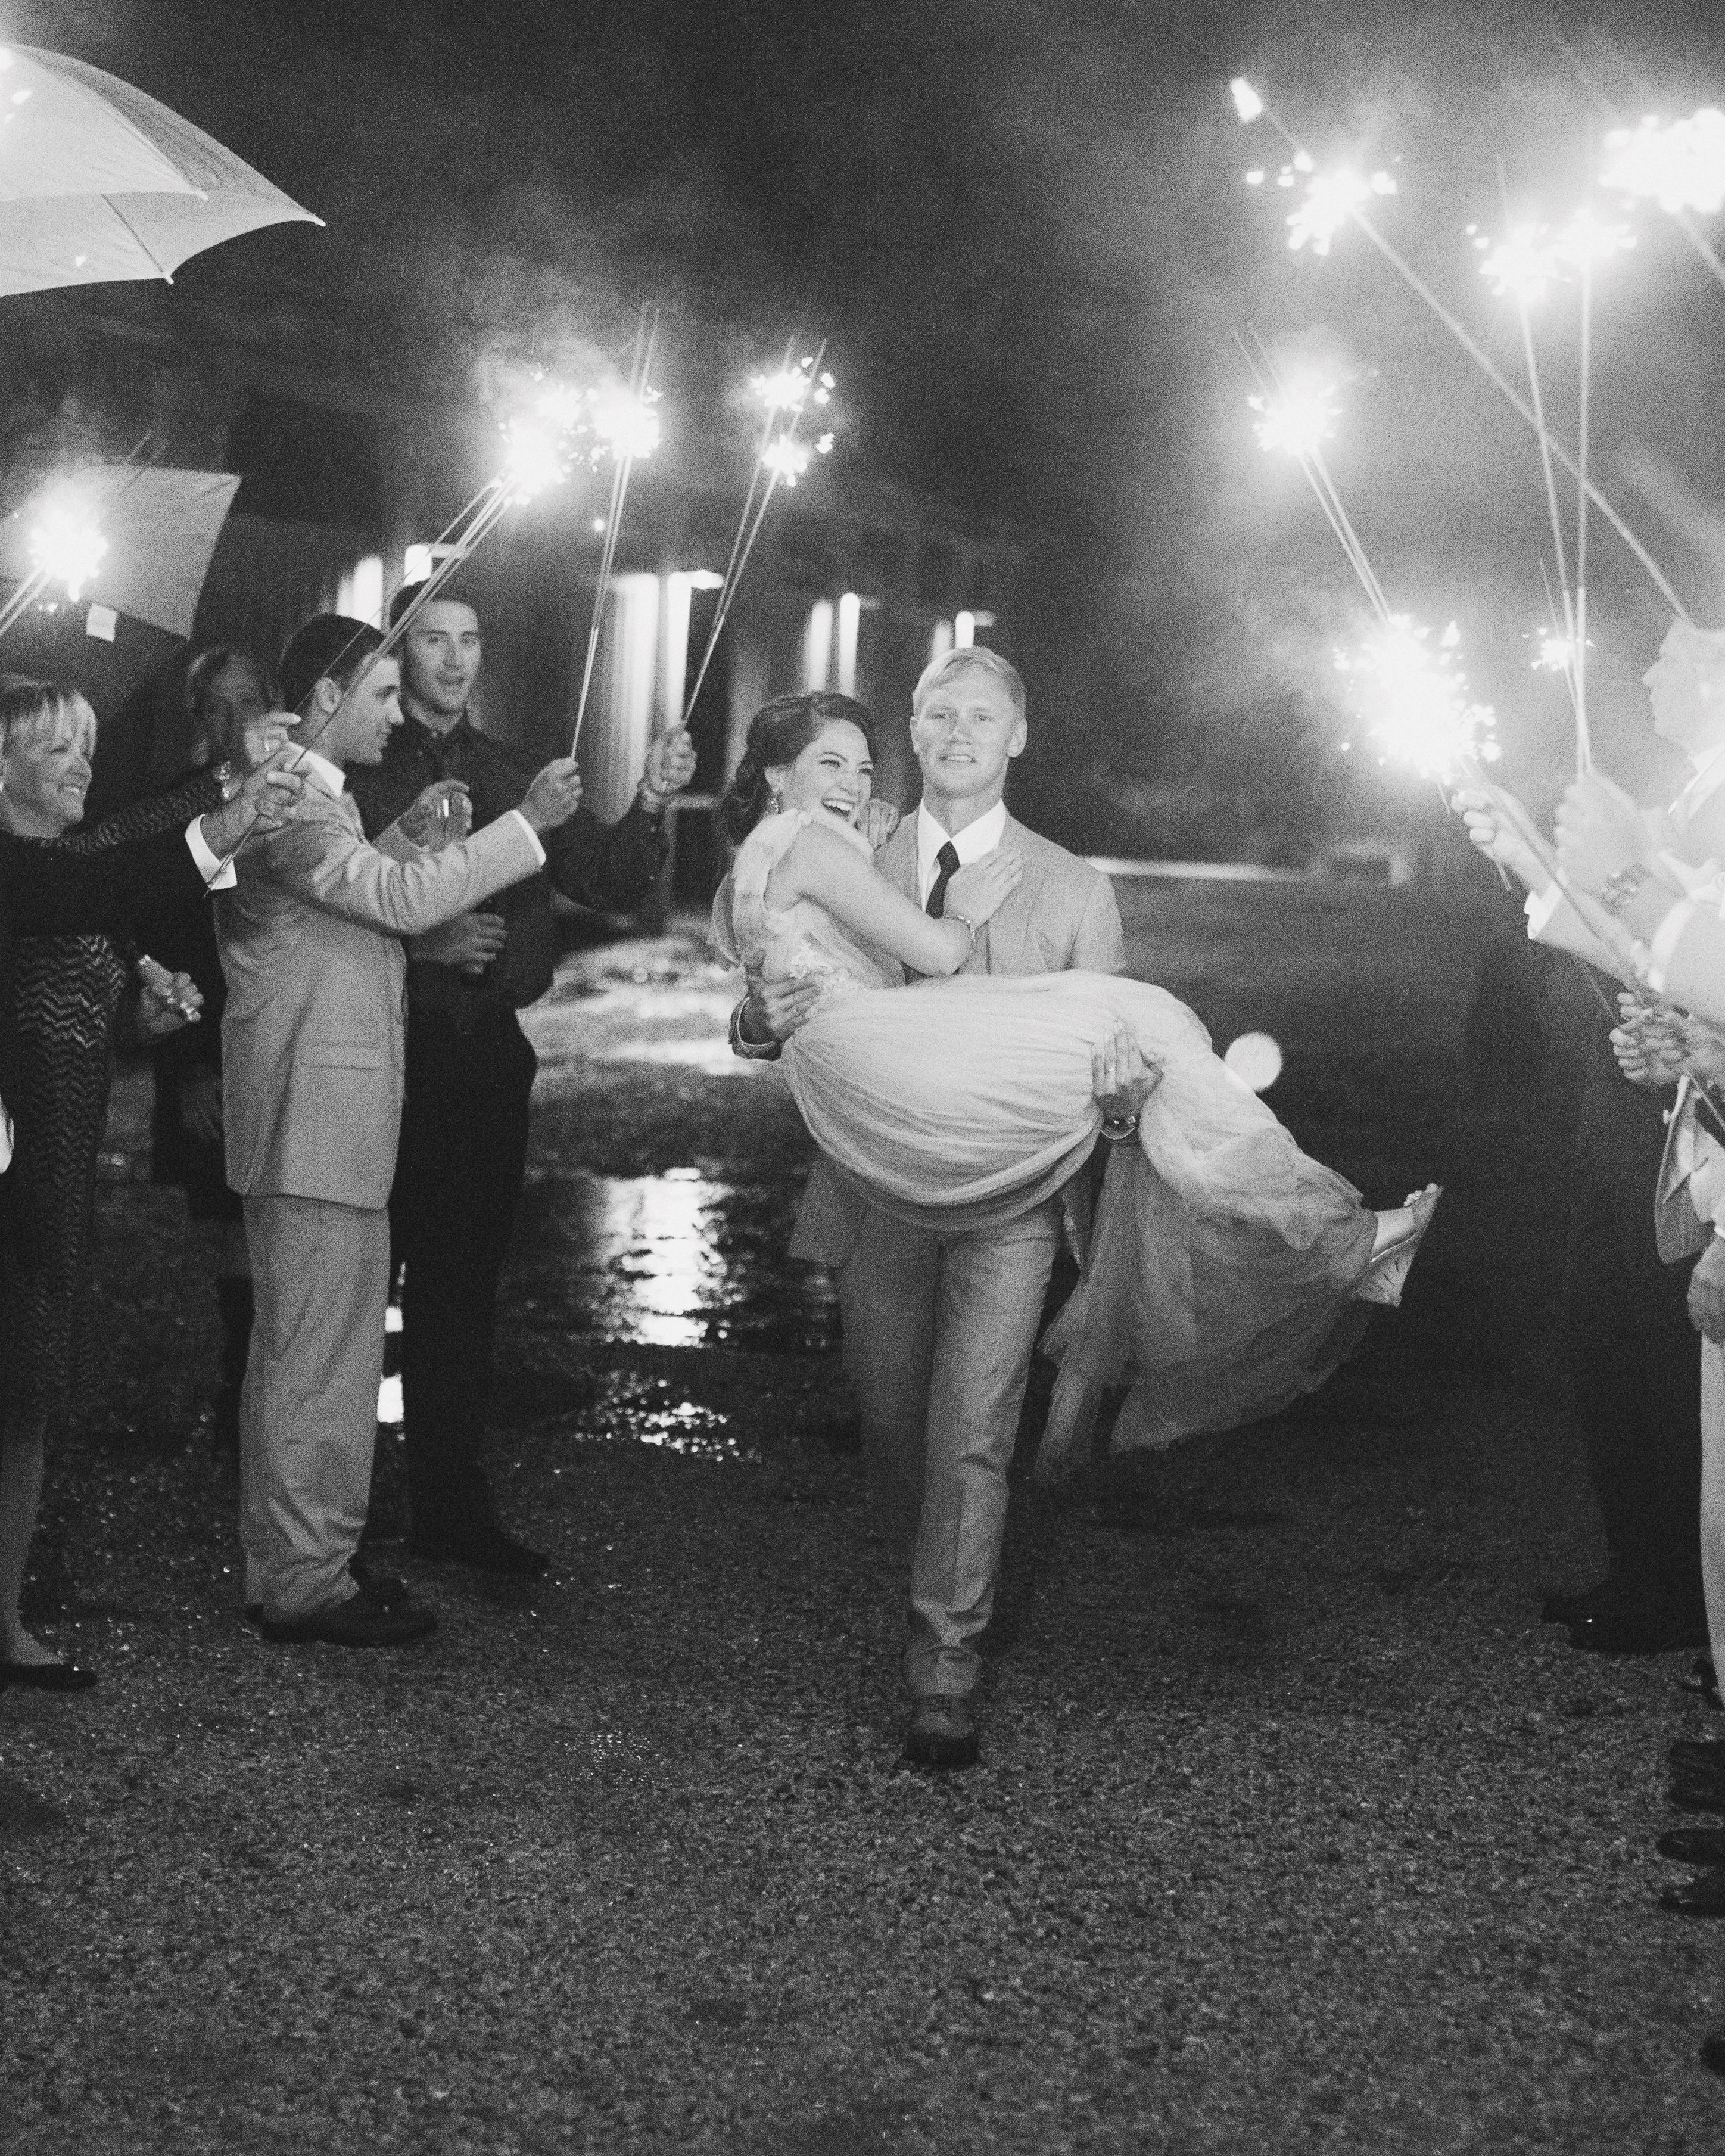 sara-matt-wedding-sparklers-42582-s111990-0715.jpg